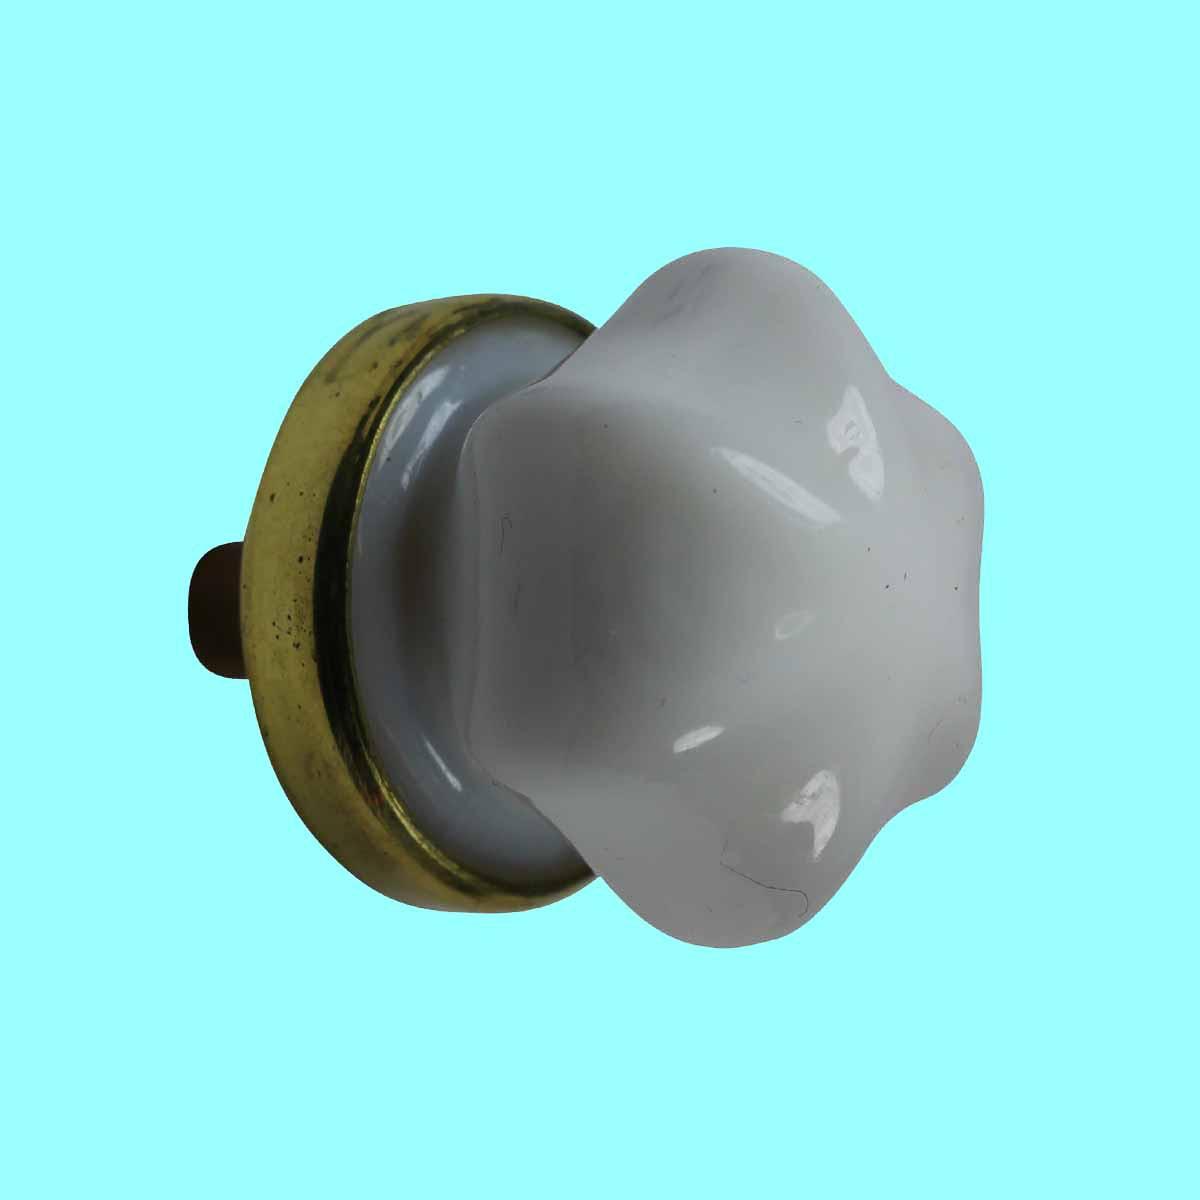 ... U003cPREu003eCabinet Knob Milk Glass 1inch Dia W/ Brass Back U003c/ ...